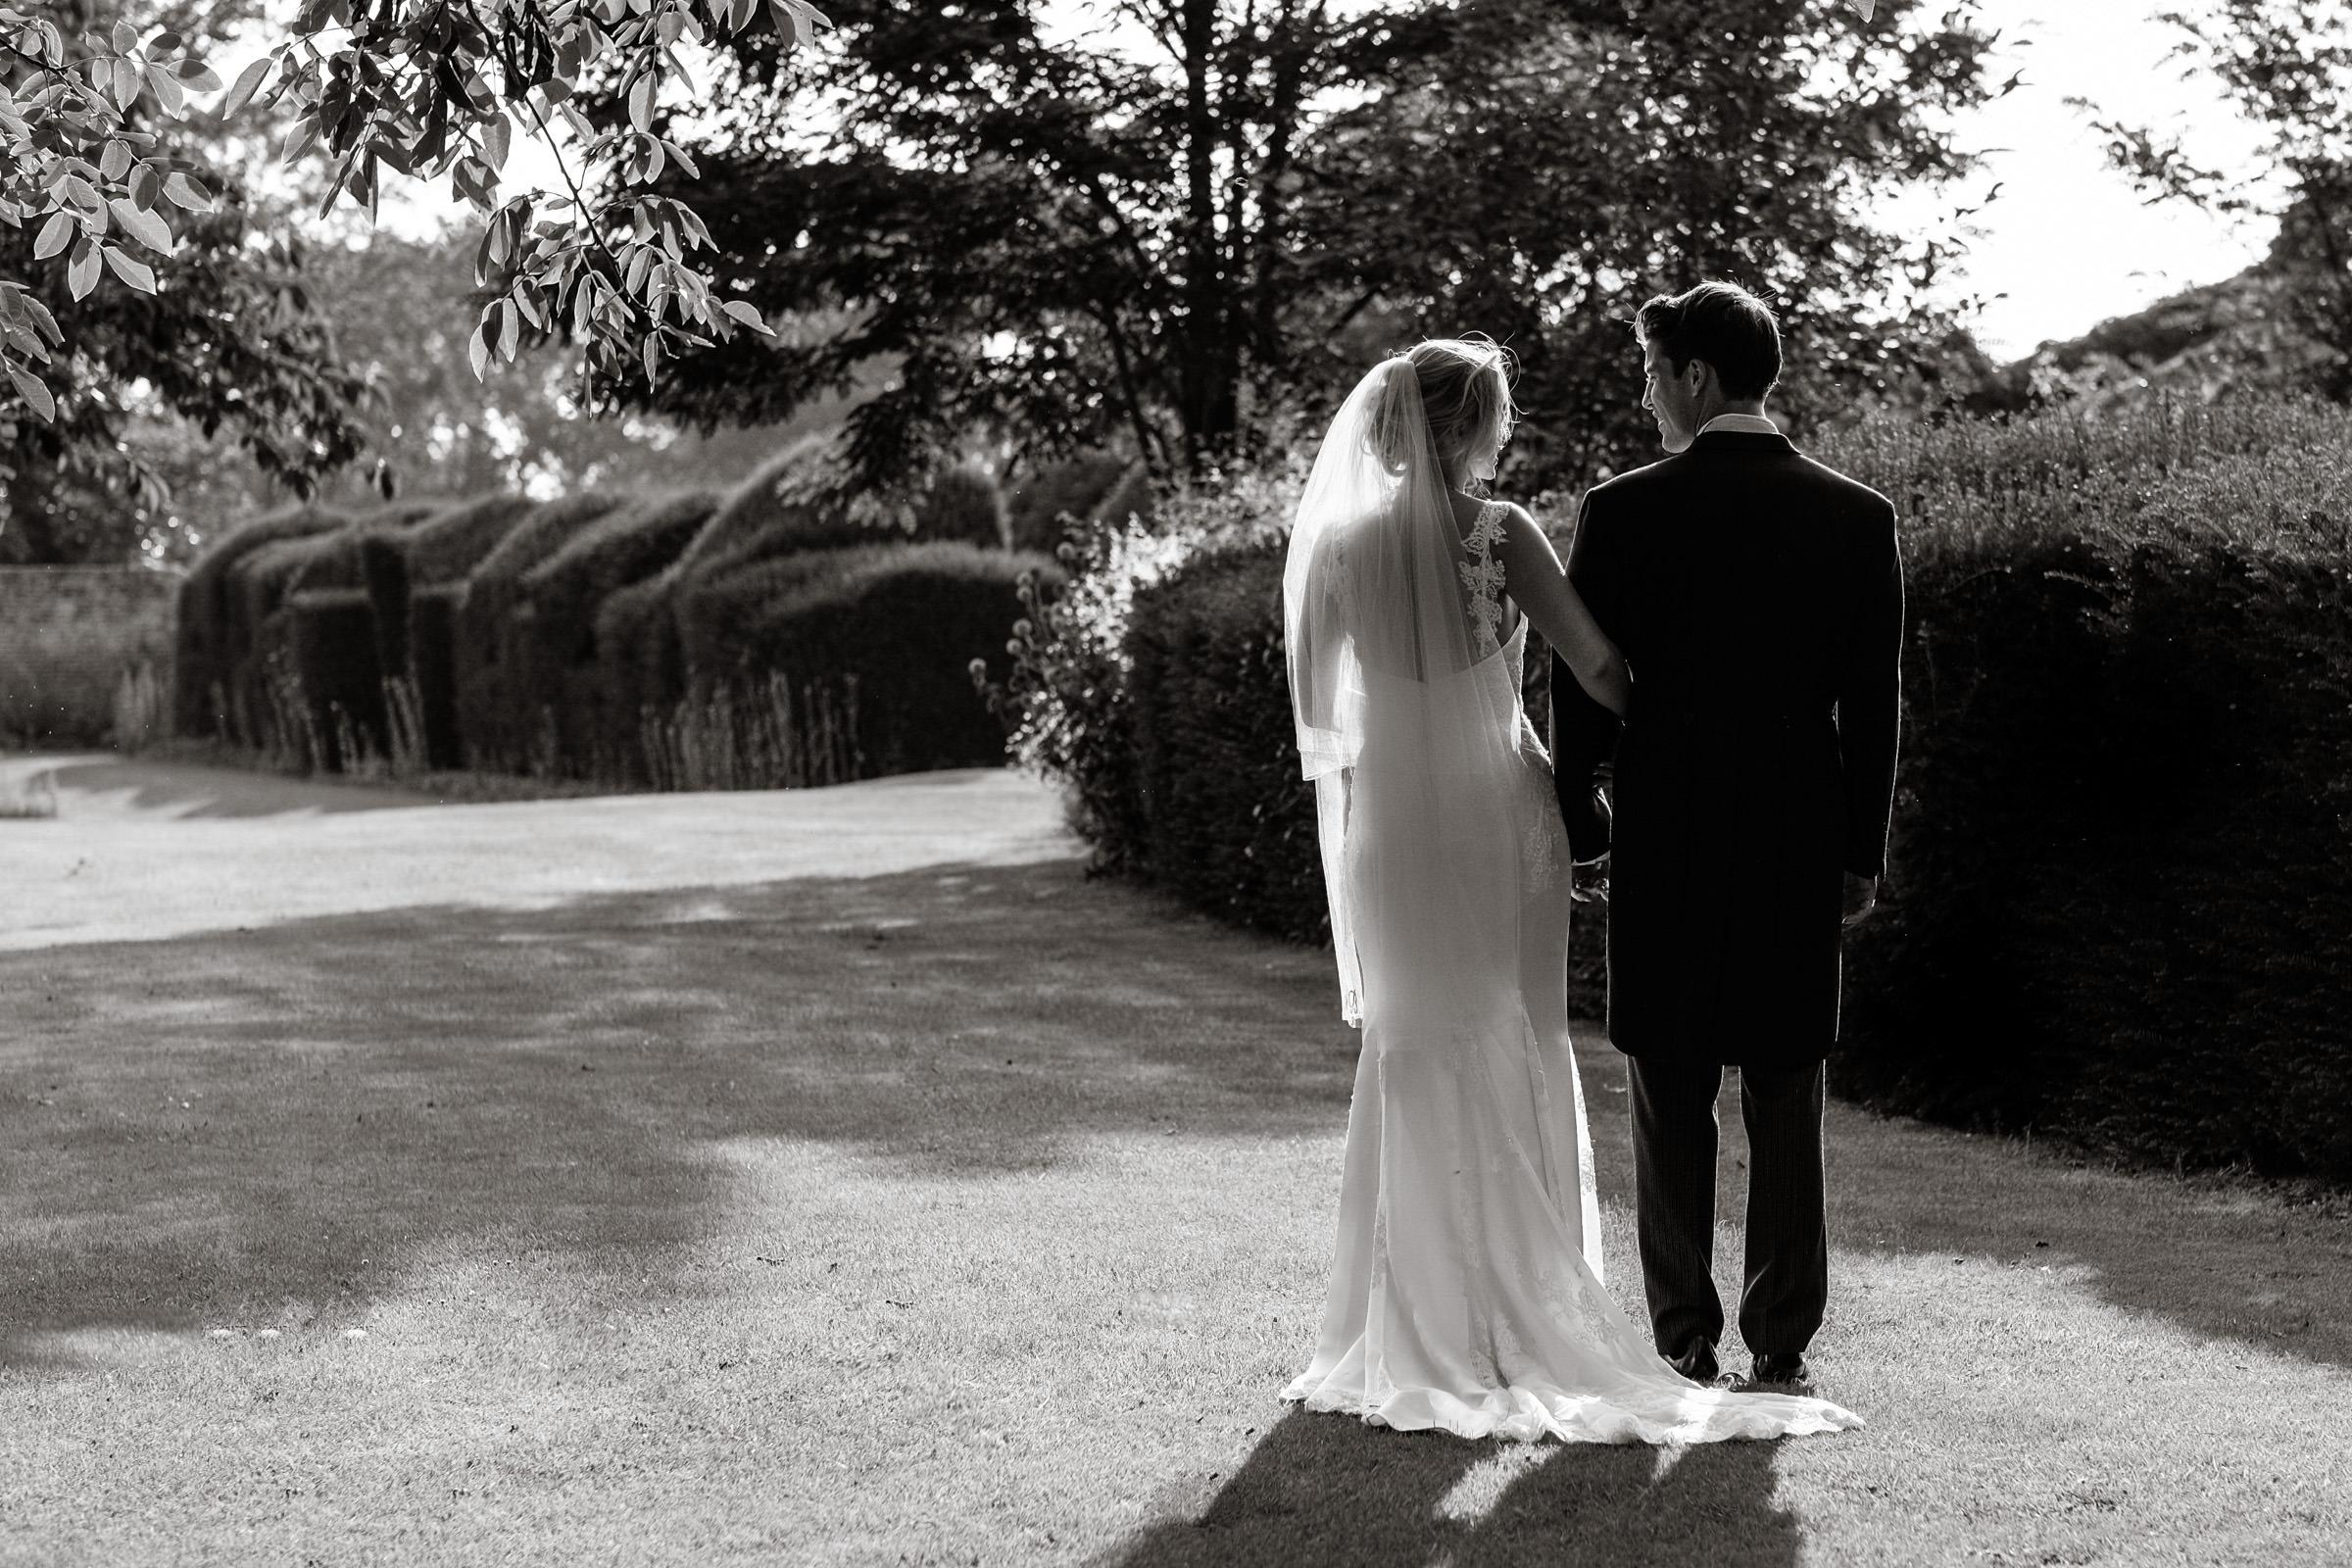 Wedding+at+Parkside+School+in+Surrey+026.jpg